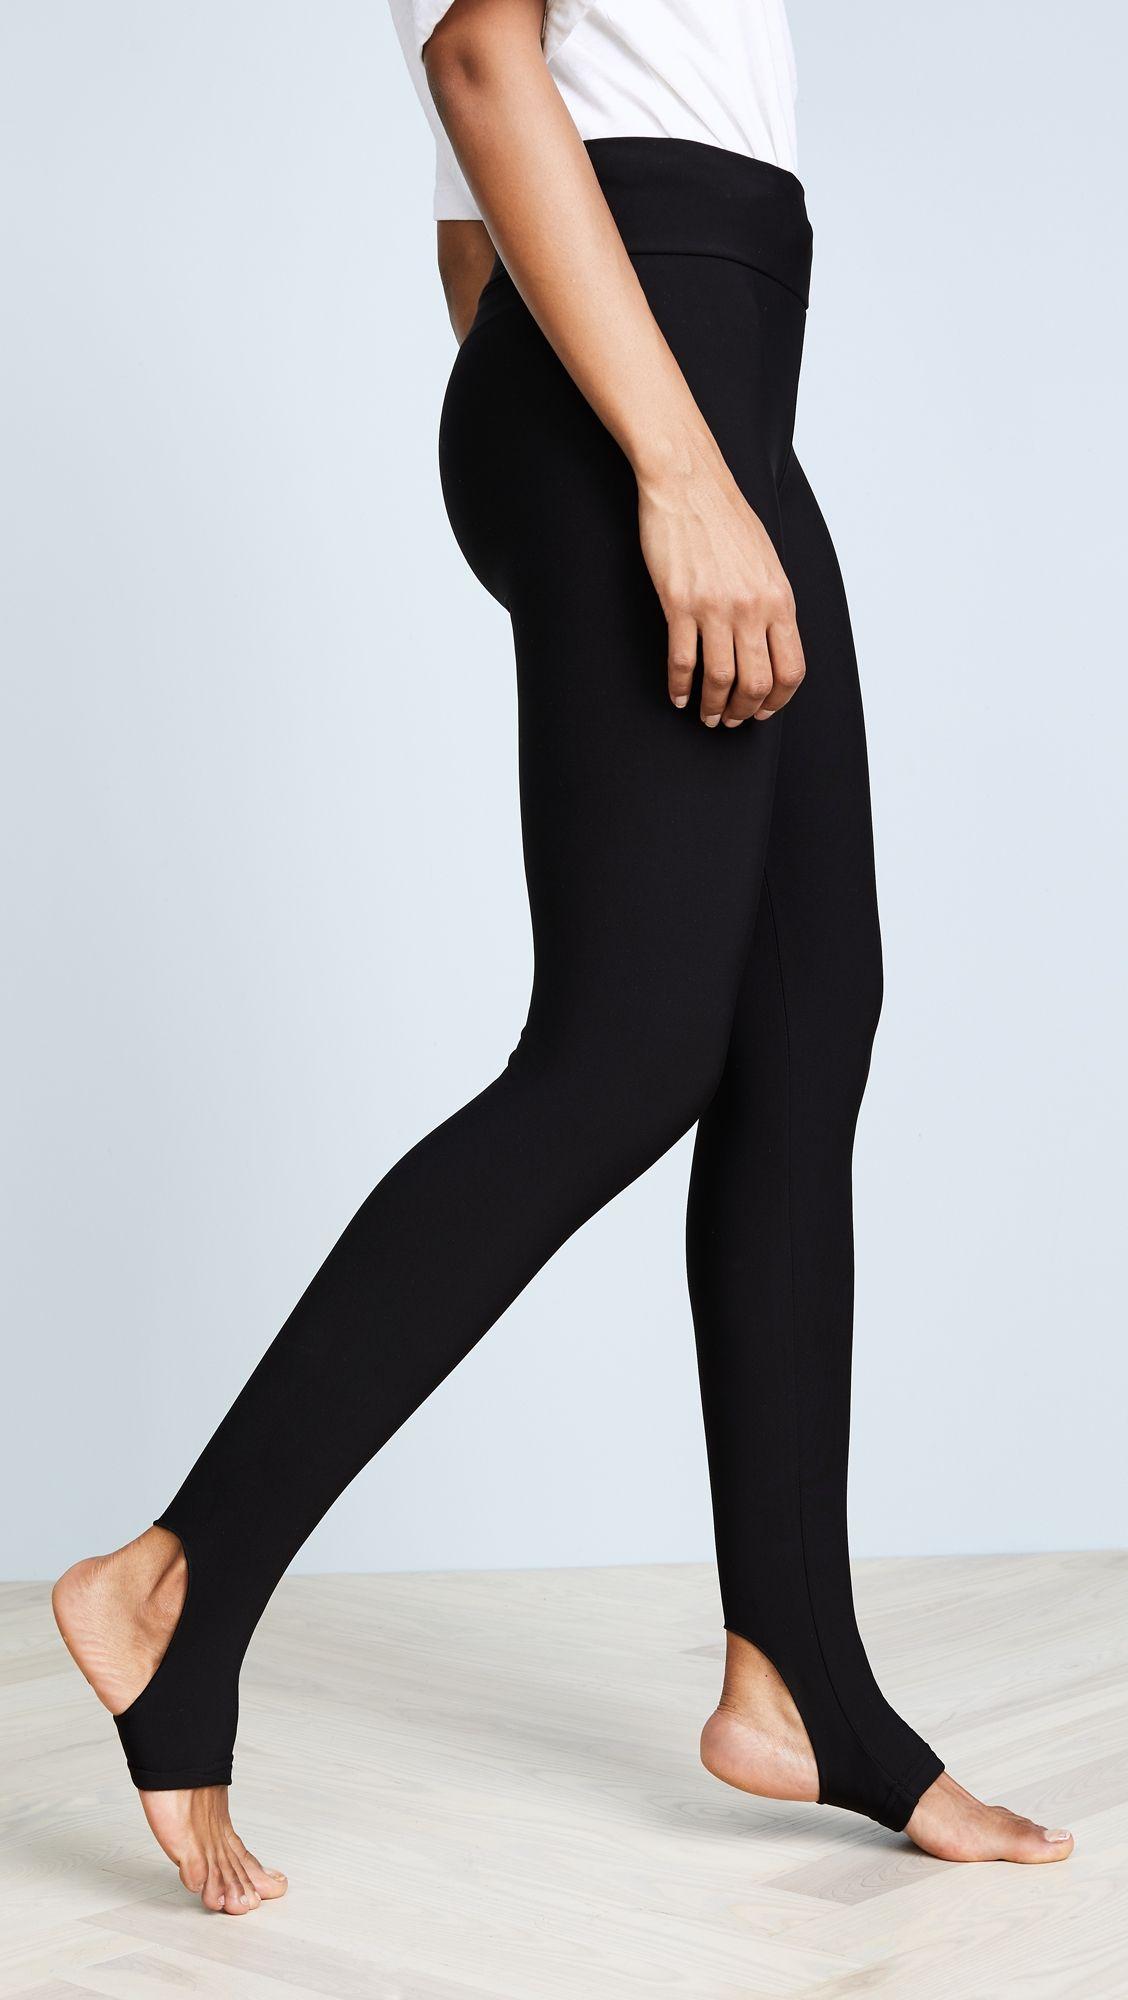 ed05a138e5d498 Plush Fleece Lined Stirrup Leggings | Products | Stirrup leggings ...